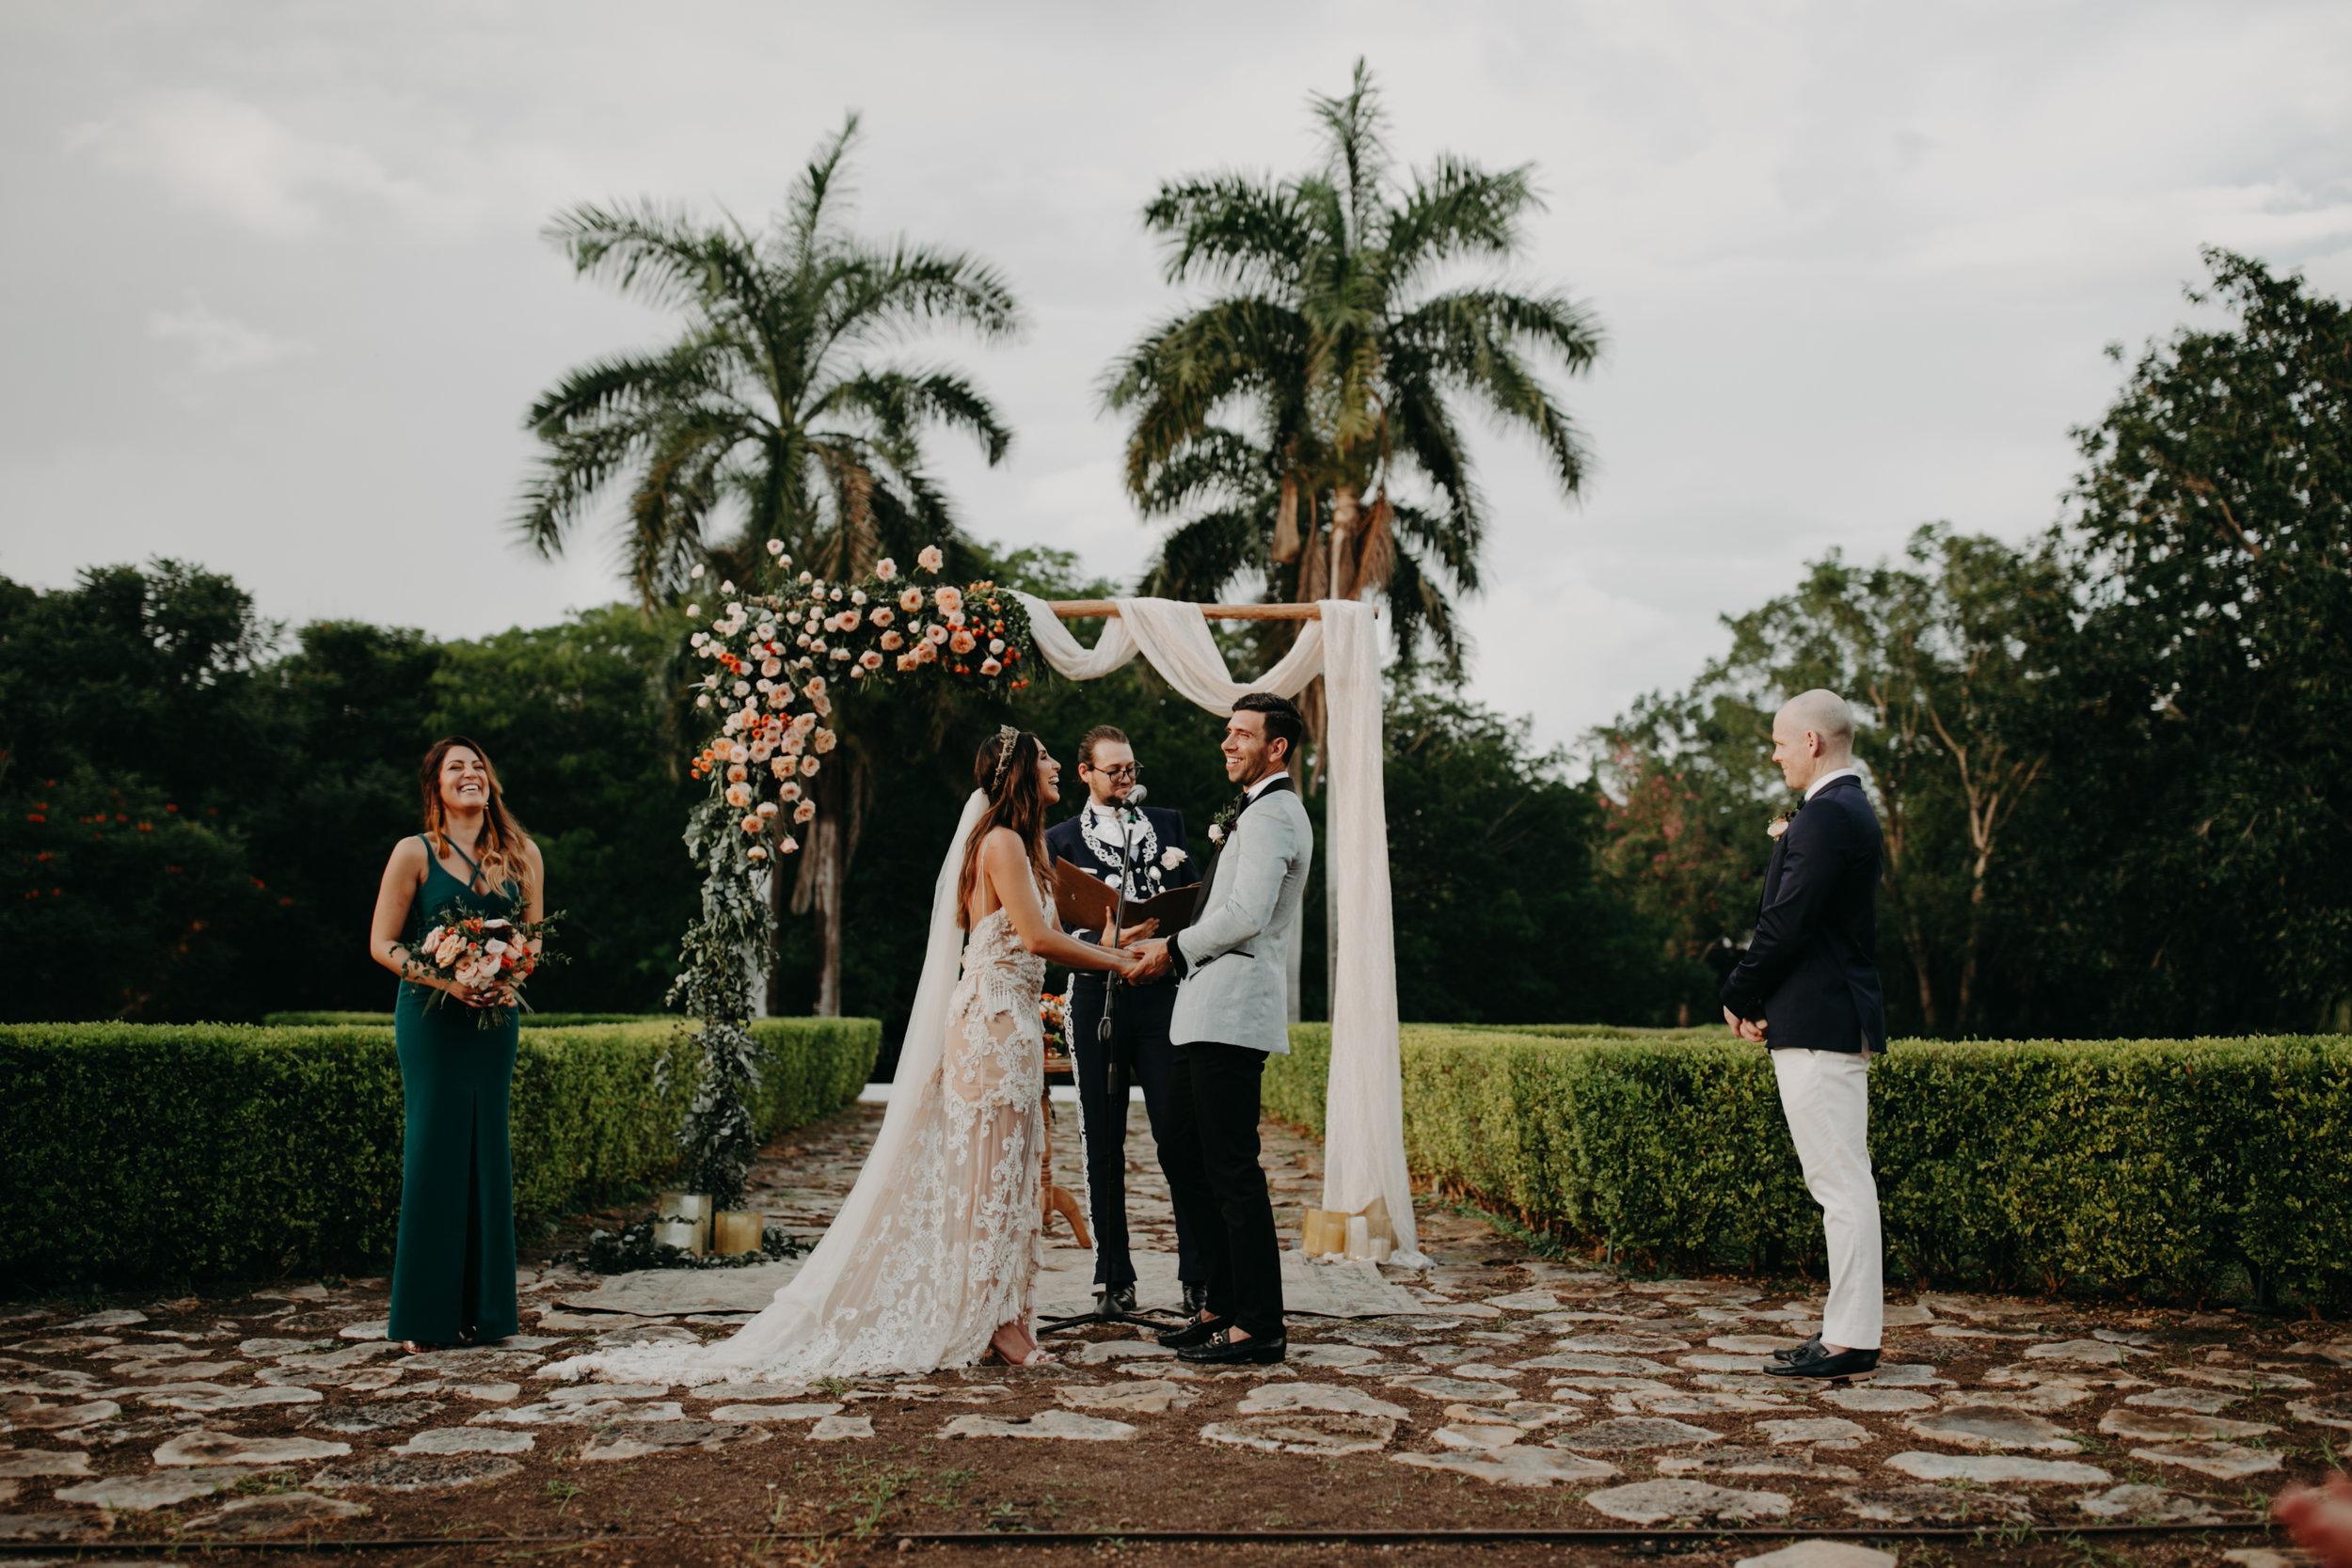 Hacienda Temozon Yucatan Mexico Wedding | Ida & Peter Emily Magers Photography-1014.jpg